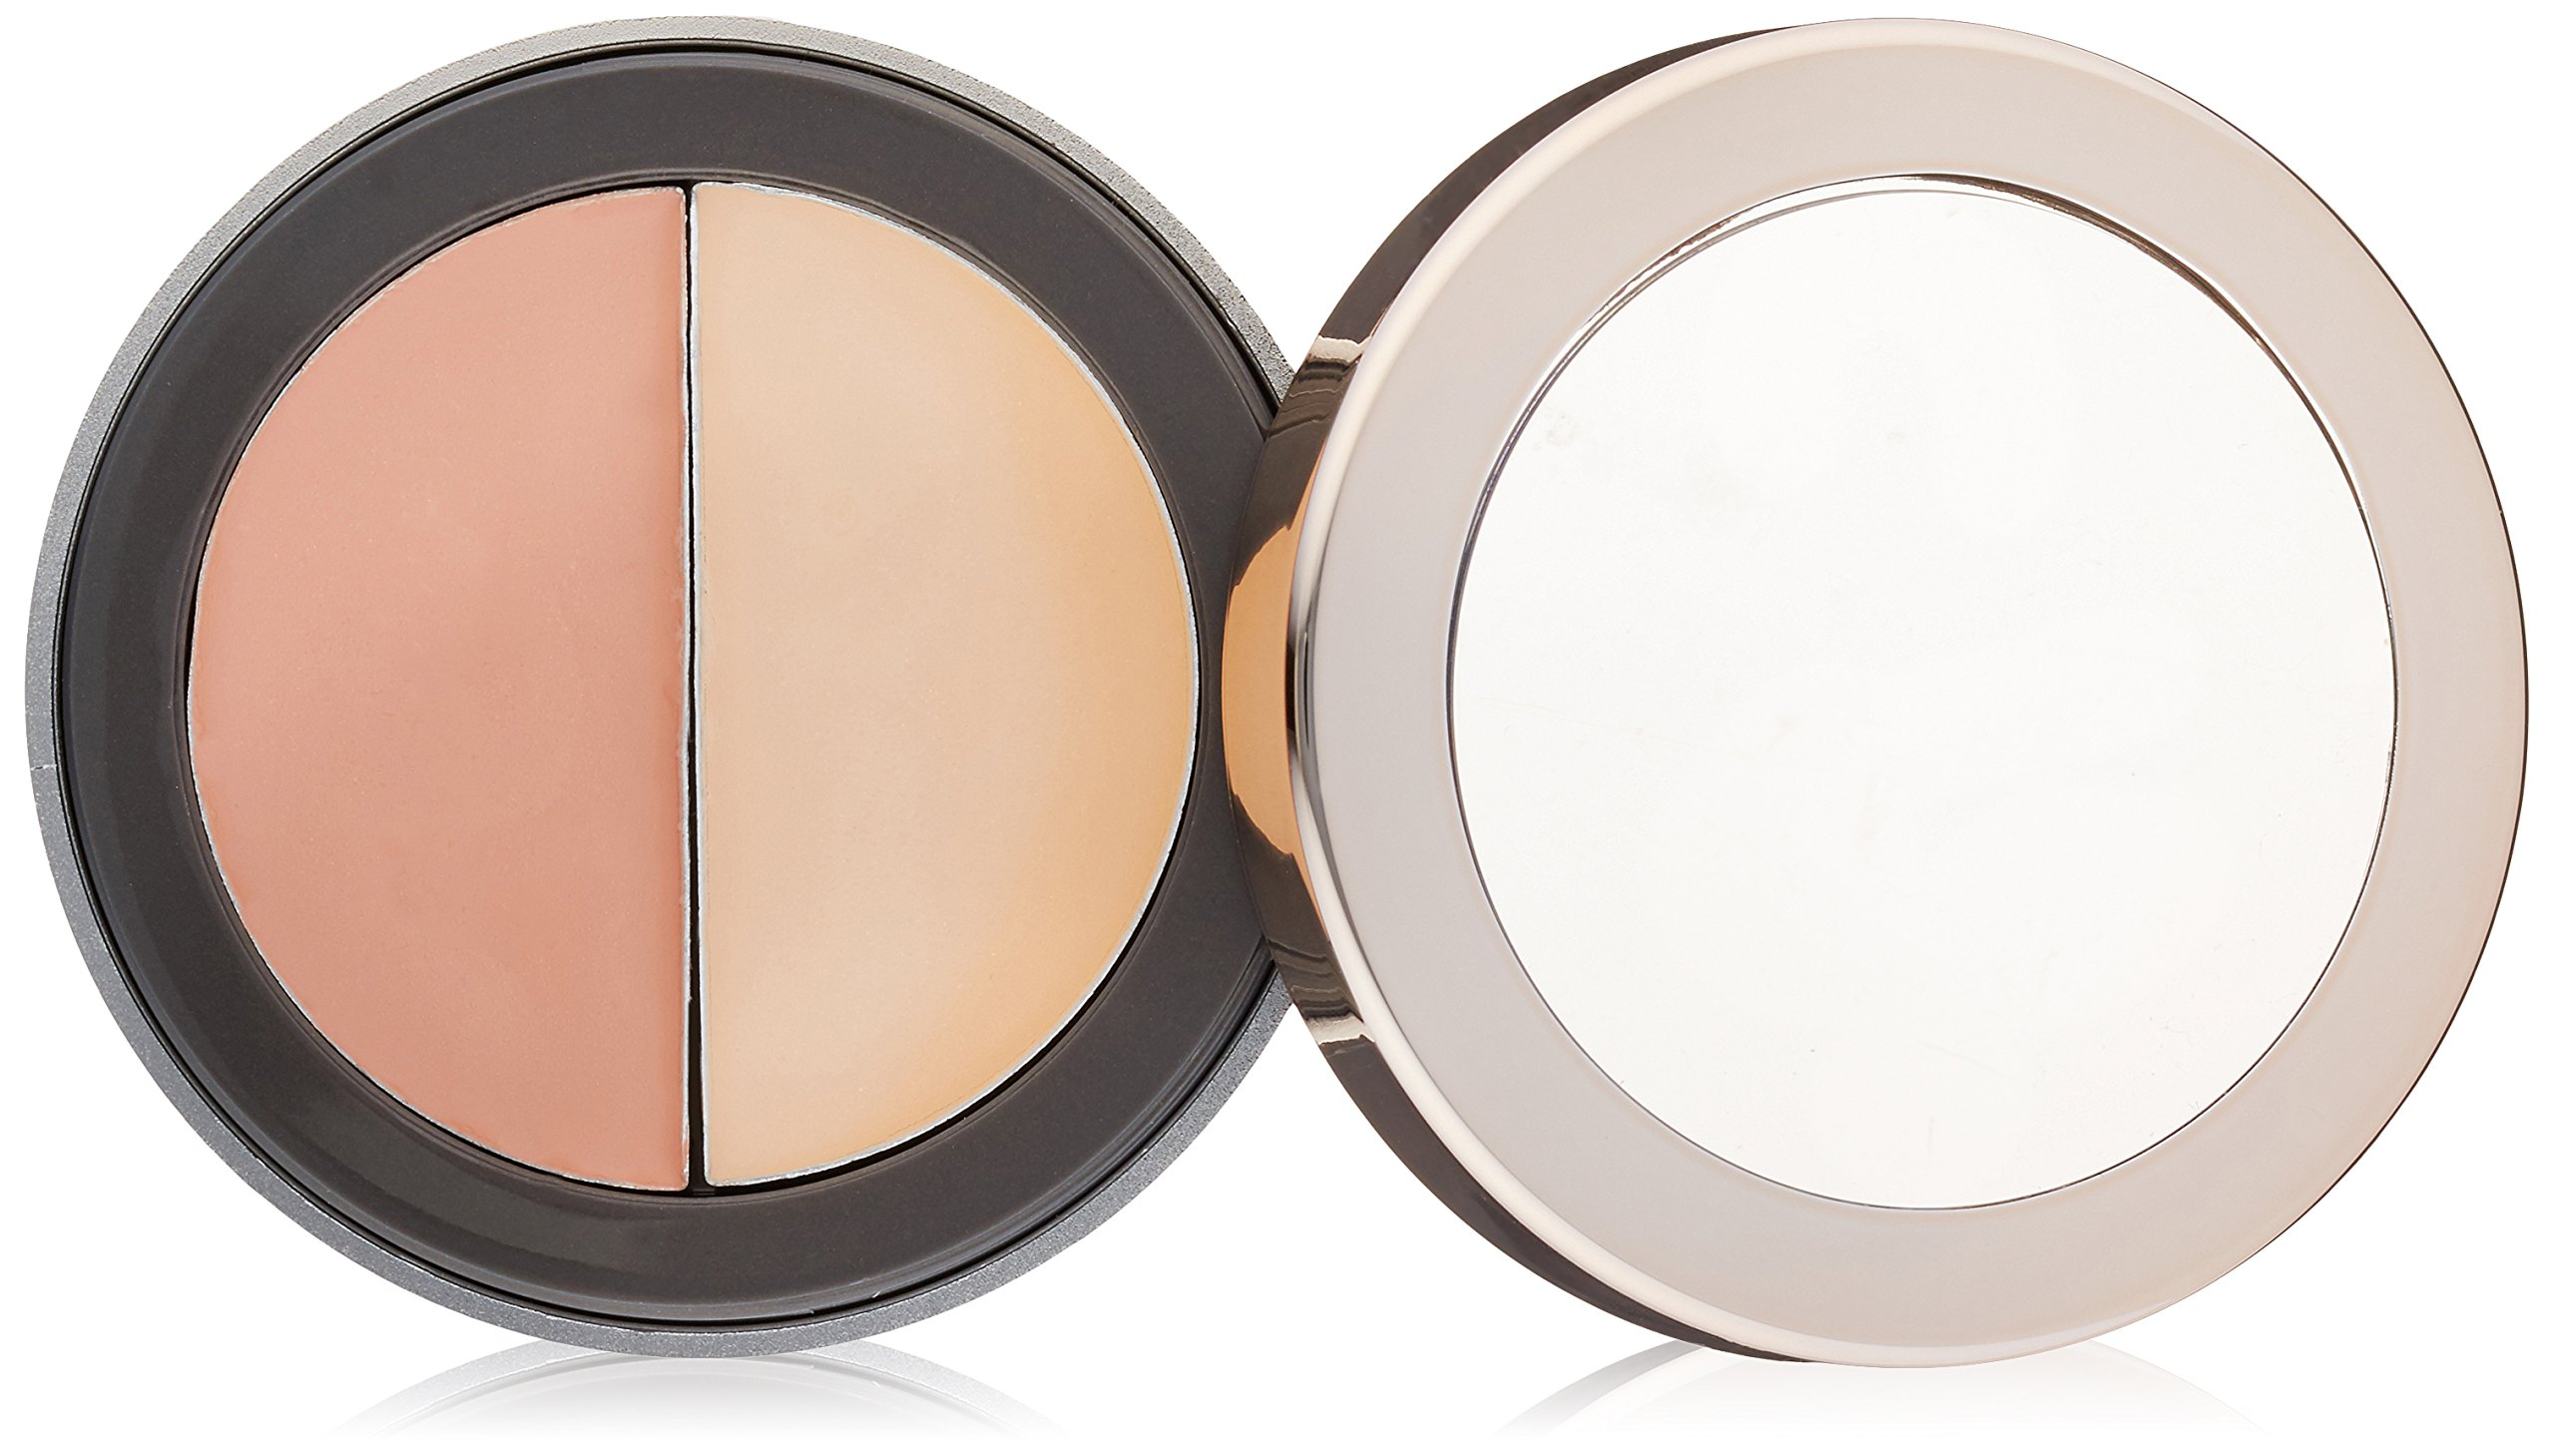 Jane Iredale Circle Delete Under Eye Concealer - #2 Peach - 2.8g/0.1oz by jane iredale